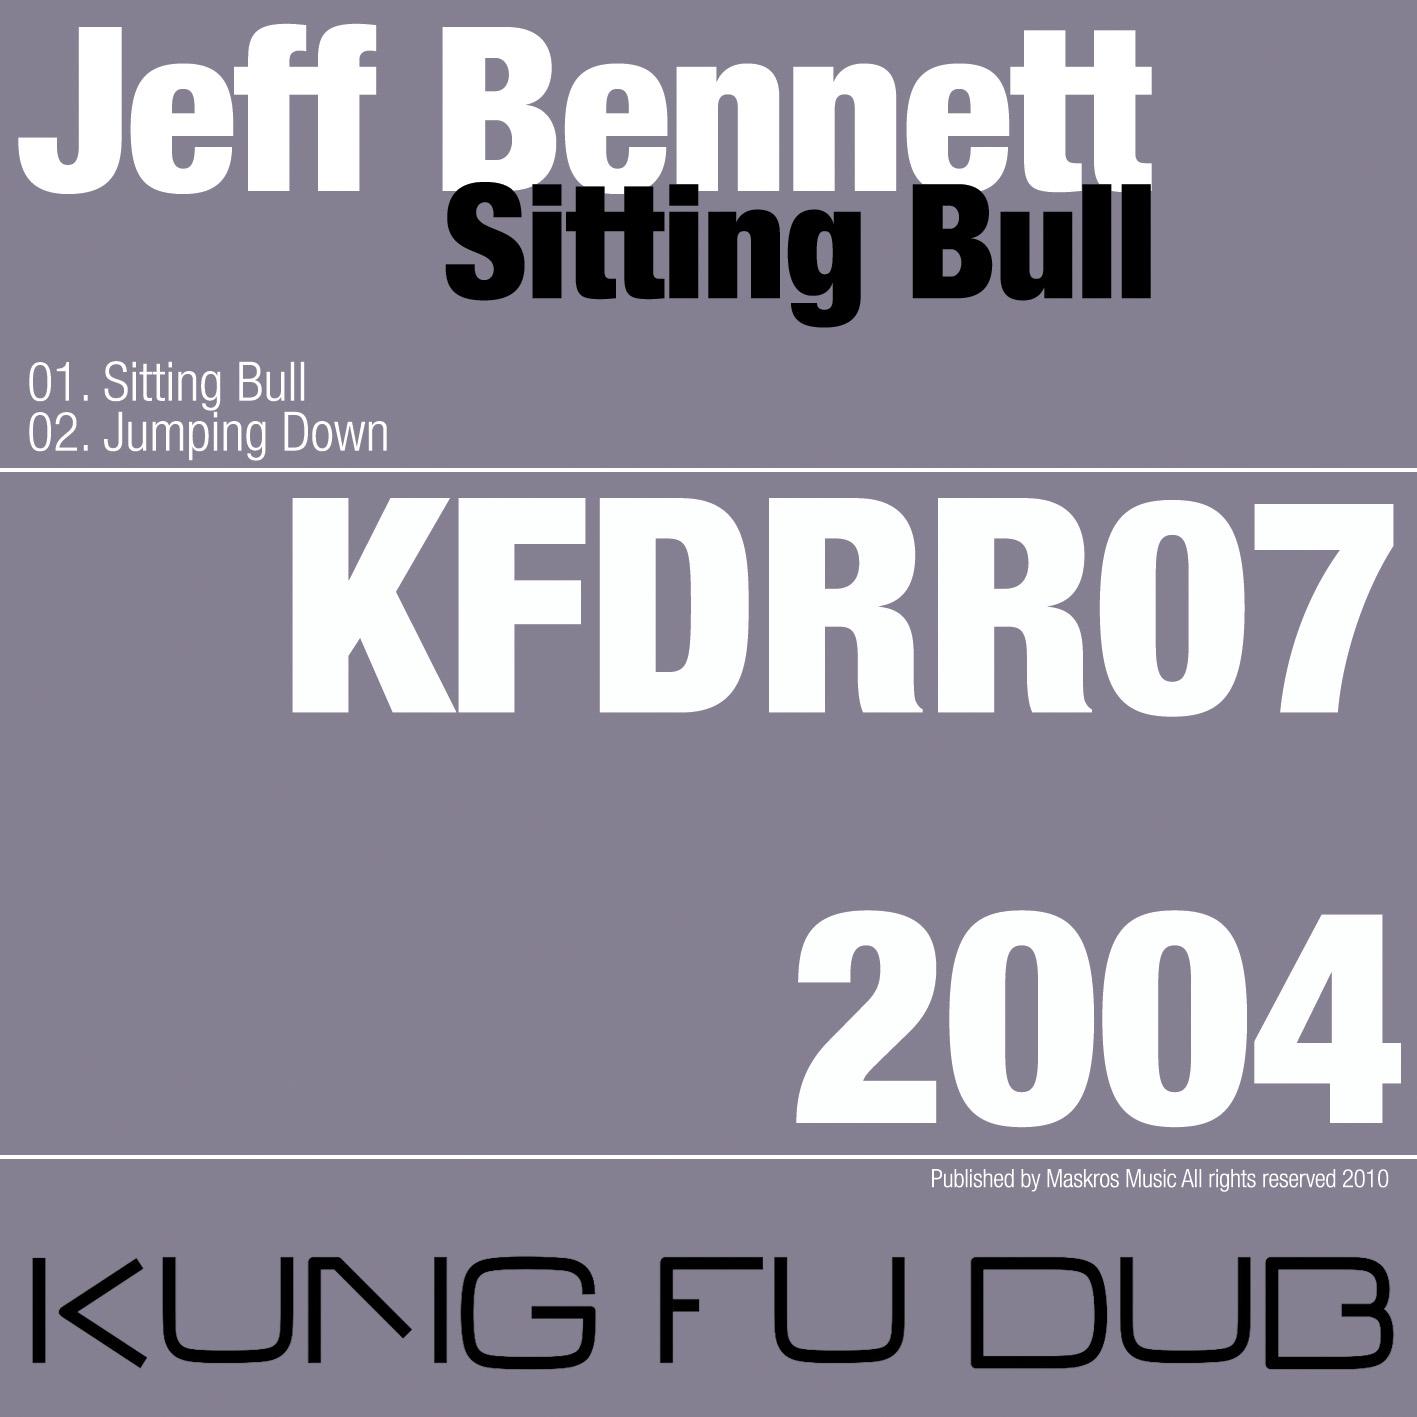 KFDRR07-label-300dpi